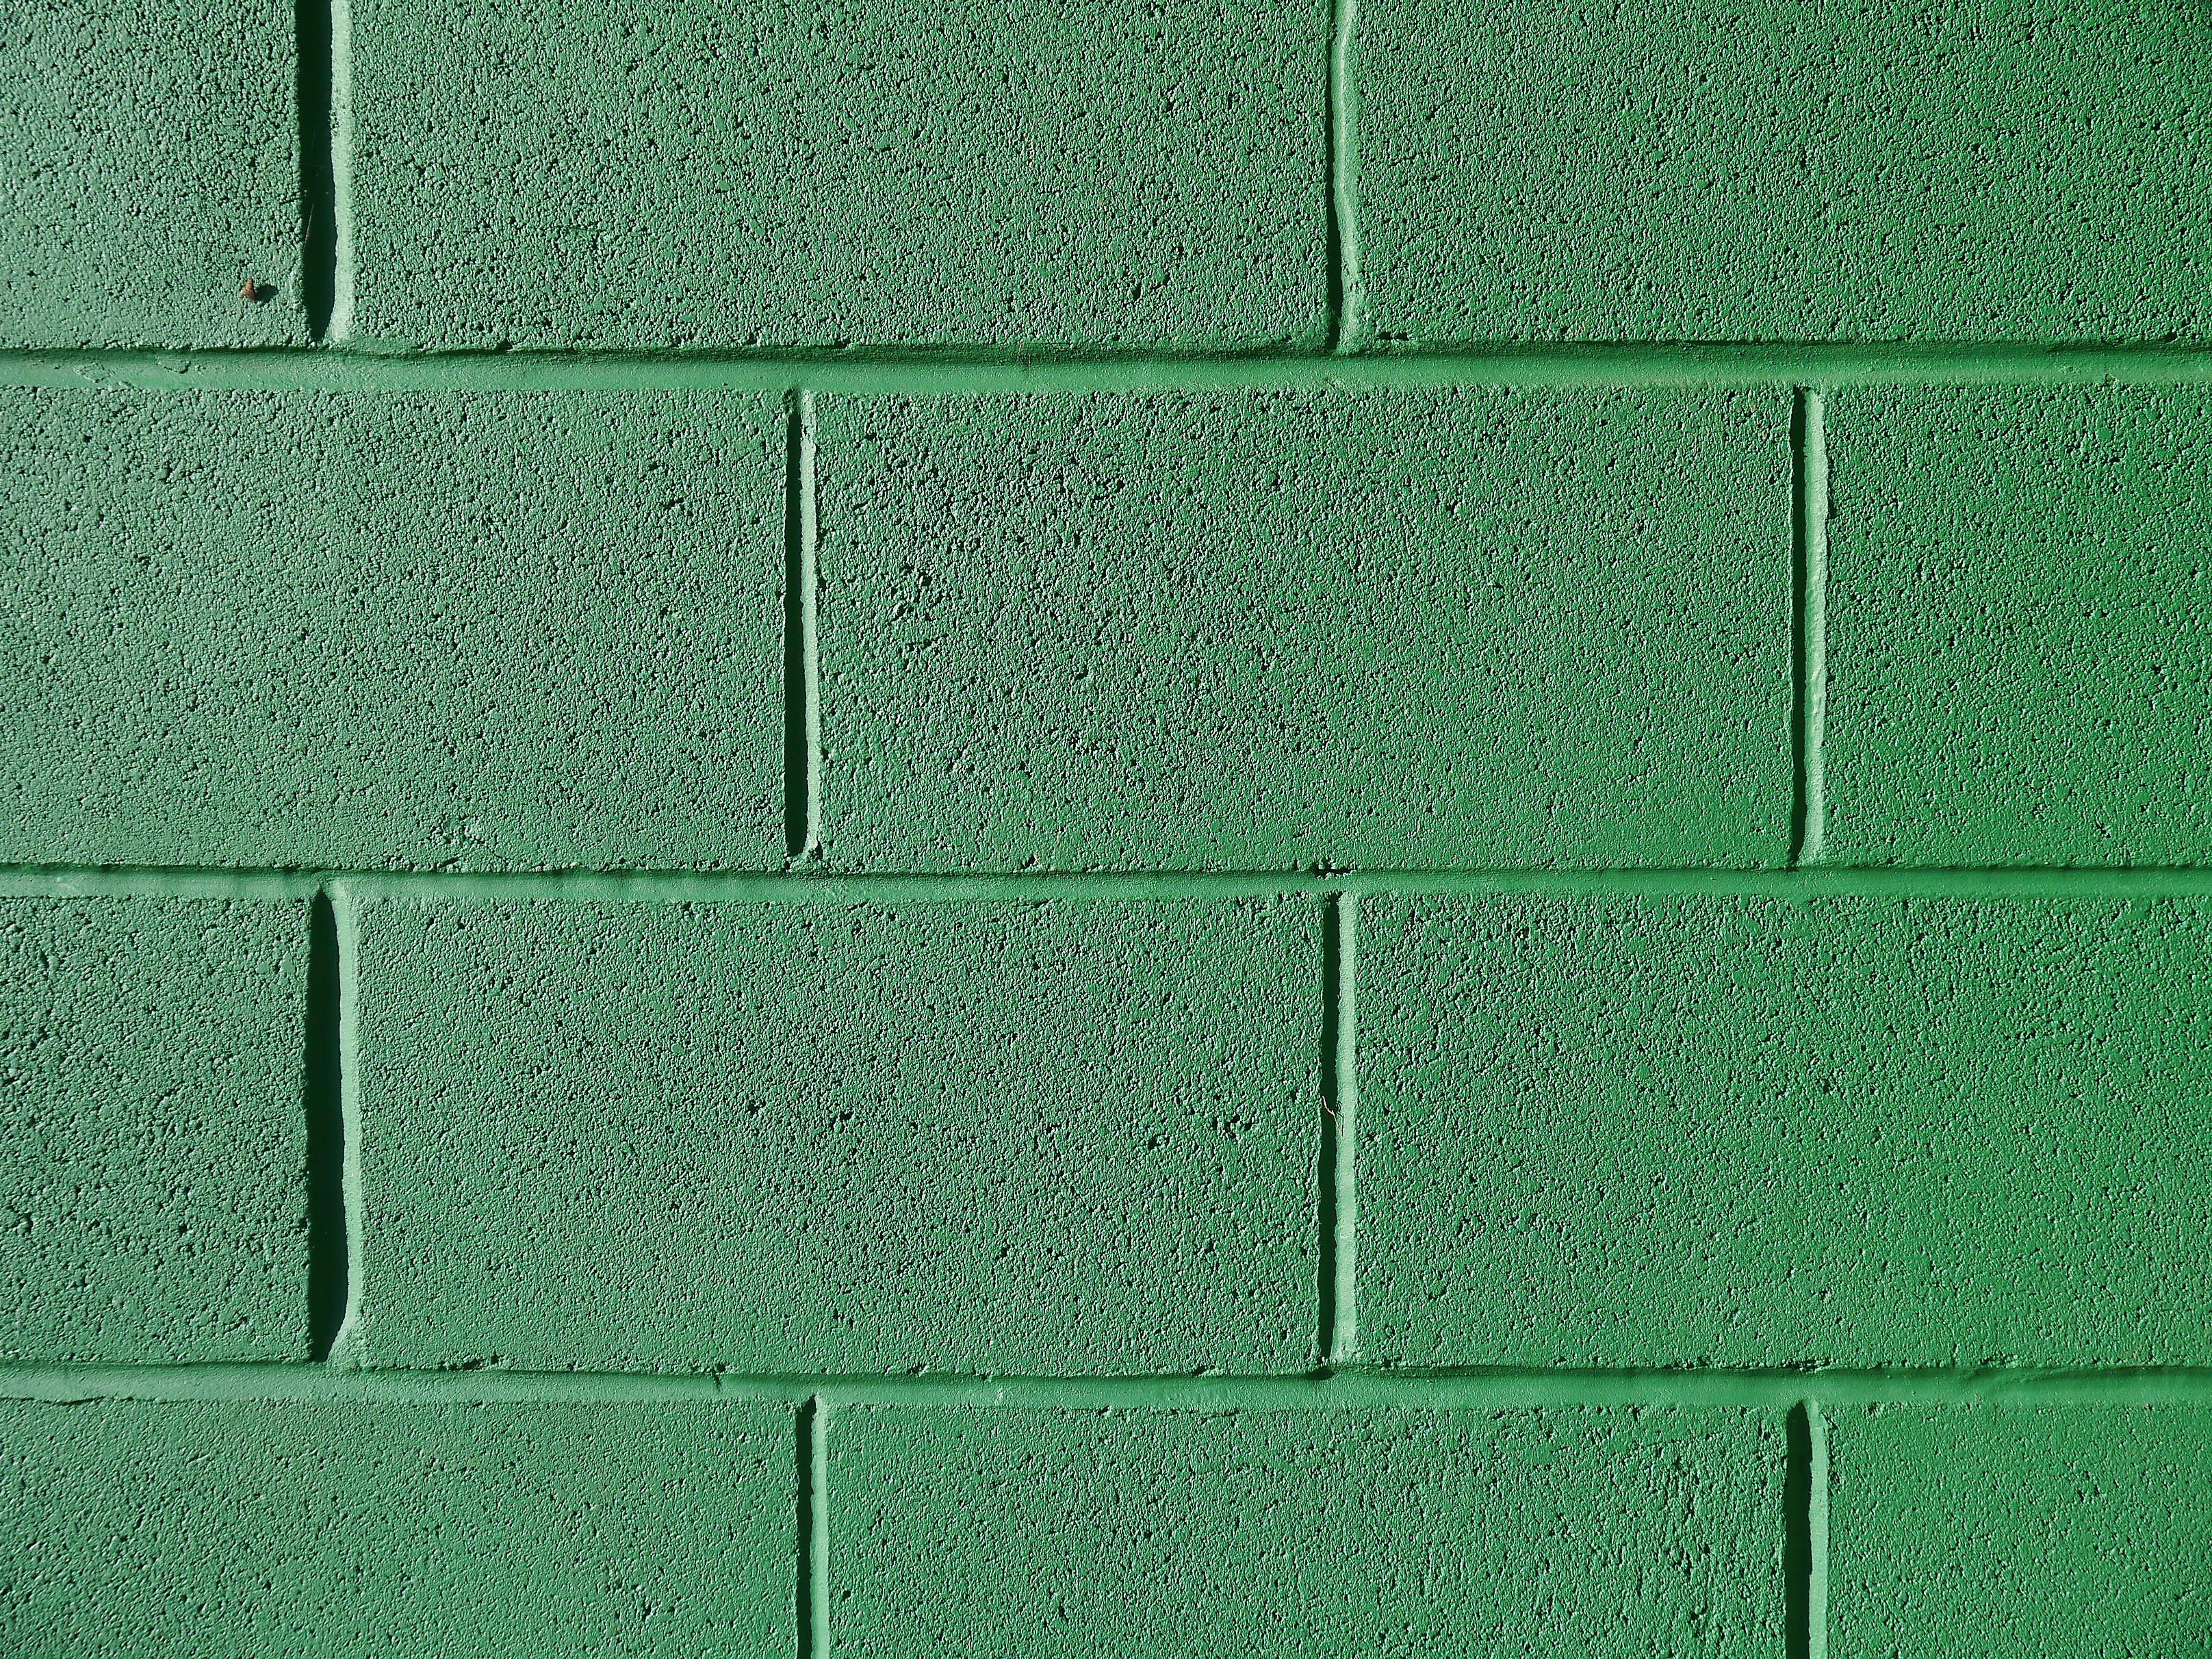 Free images texture floor building wall asphalt texture floor building wall asphalt construction pattern line green tile brick material font bricks brickwall brickwork dailygadgetfo Choice Image